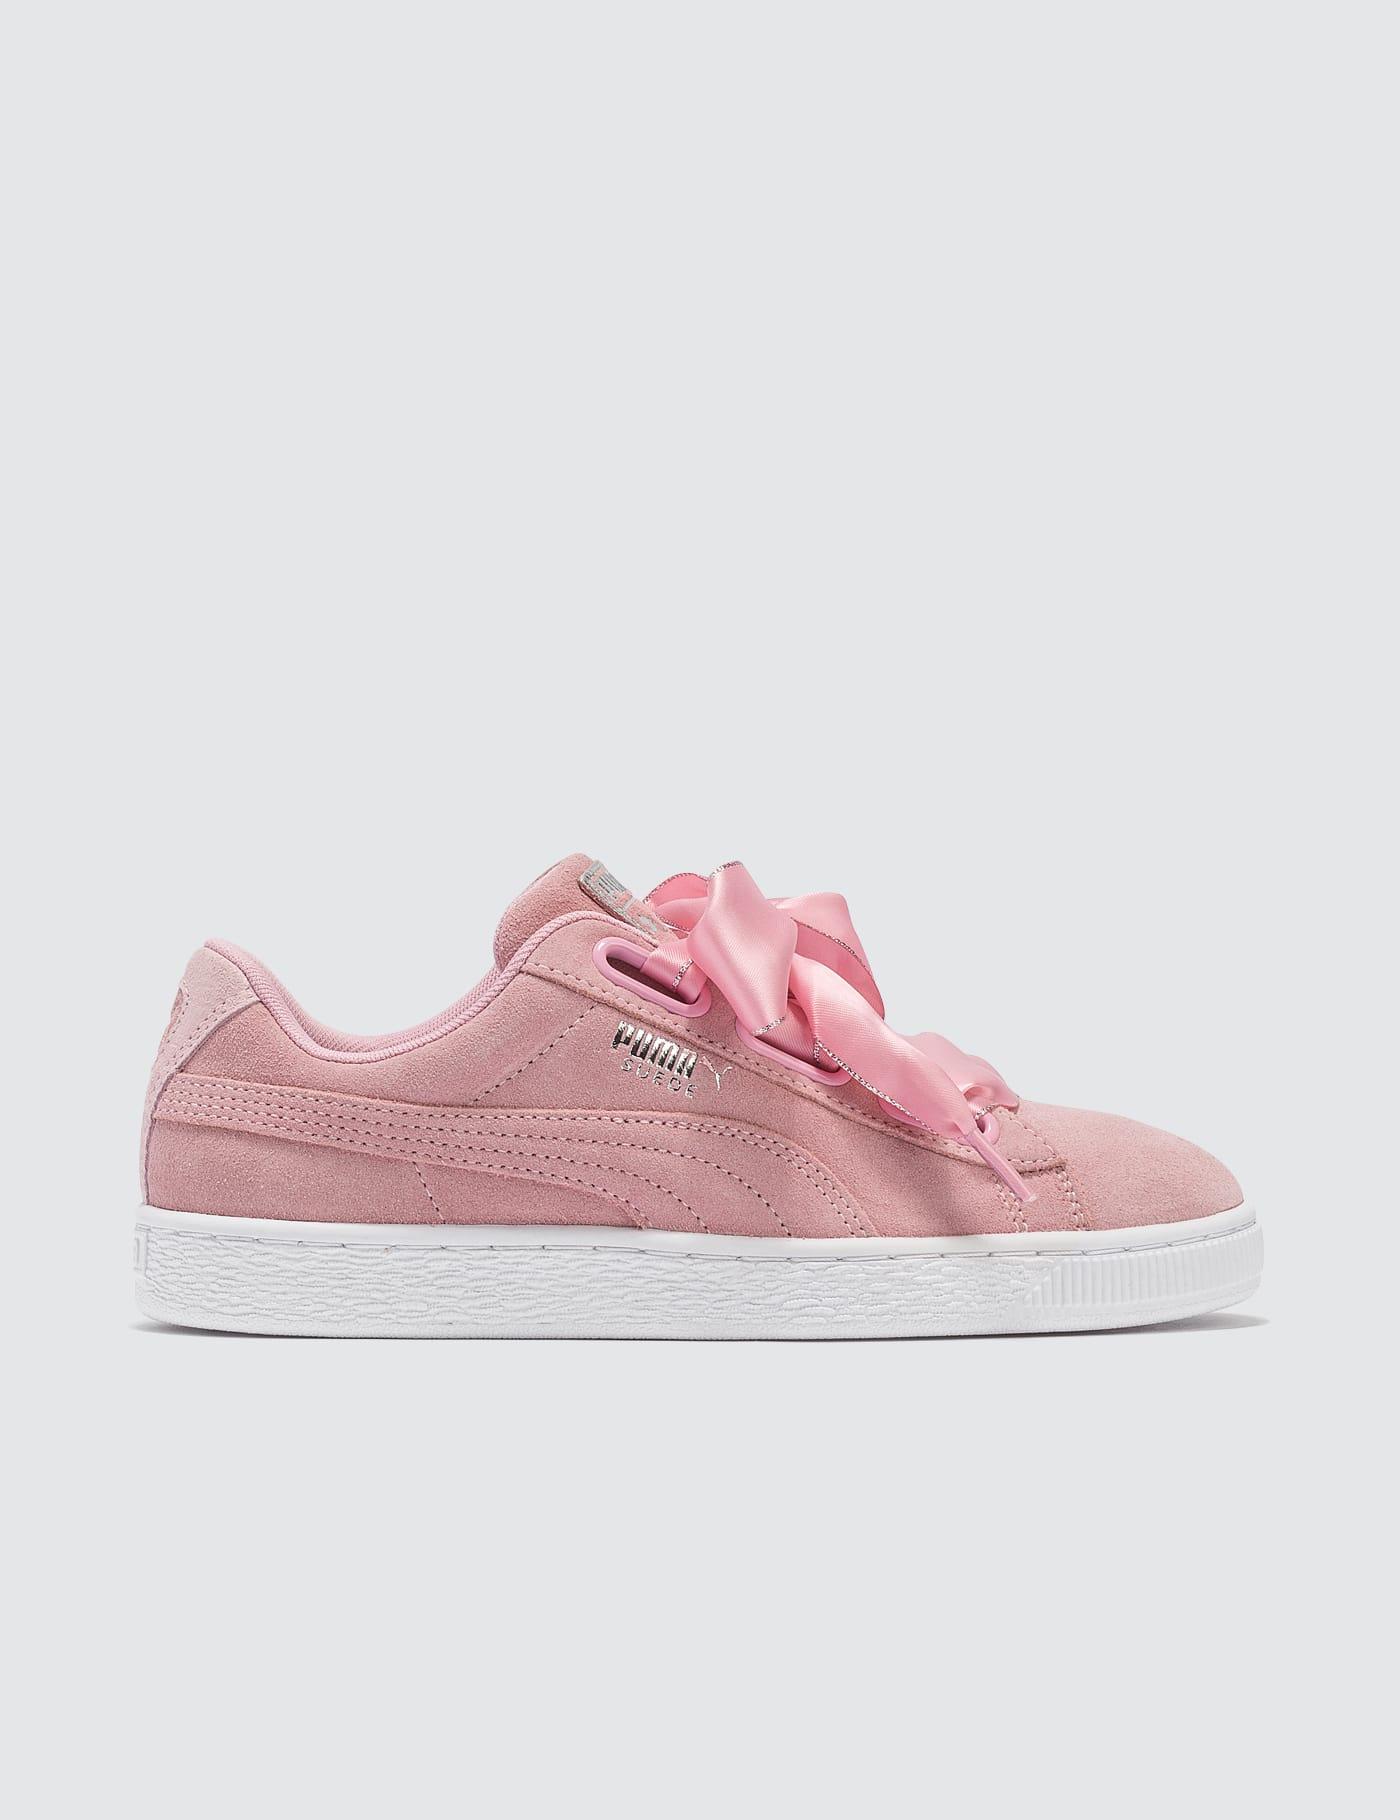 puma suede womens sneakers